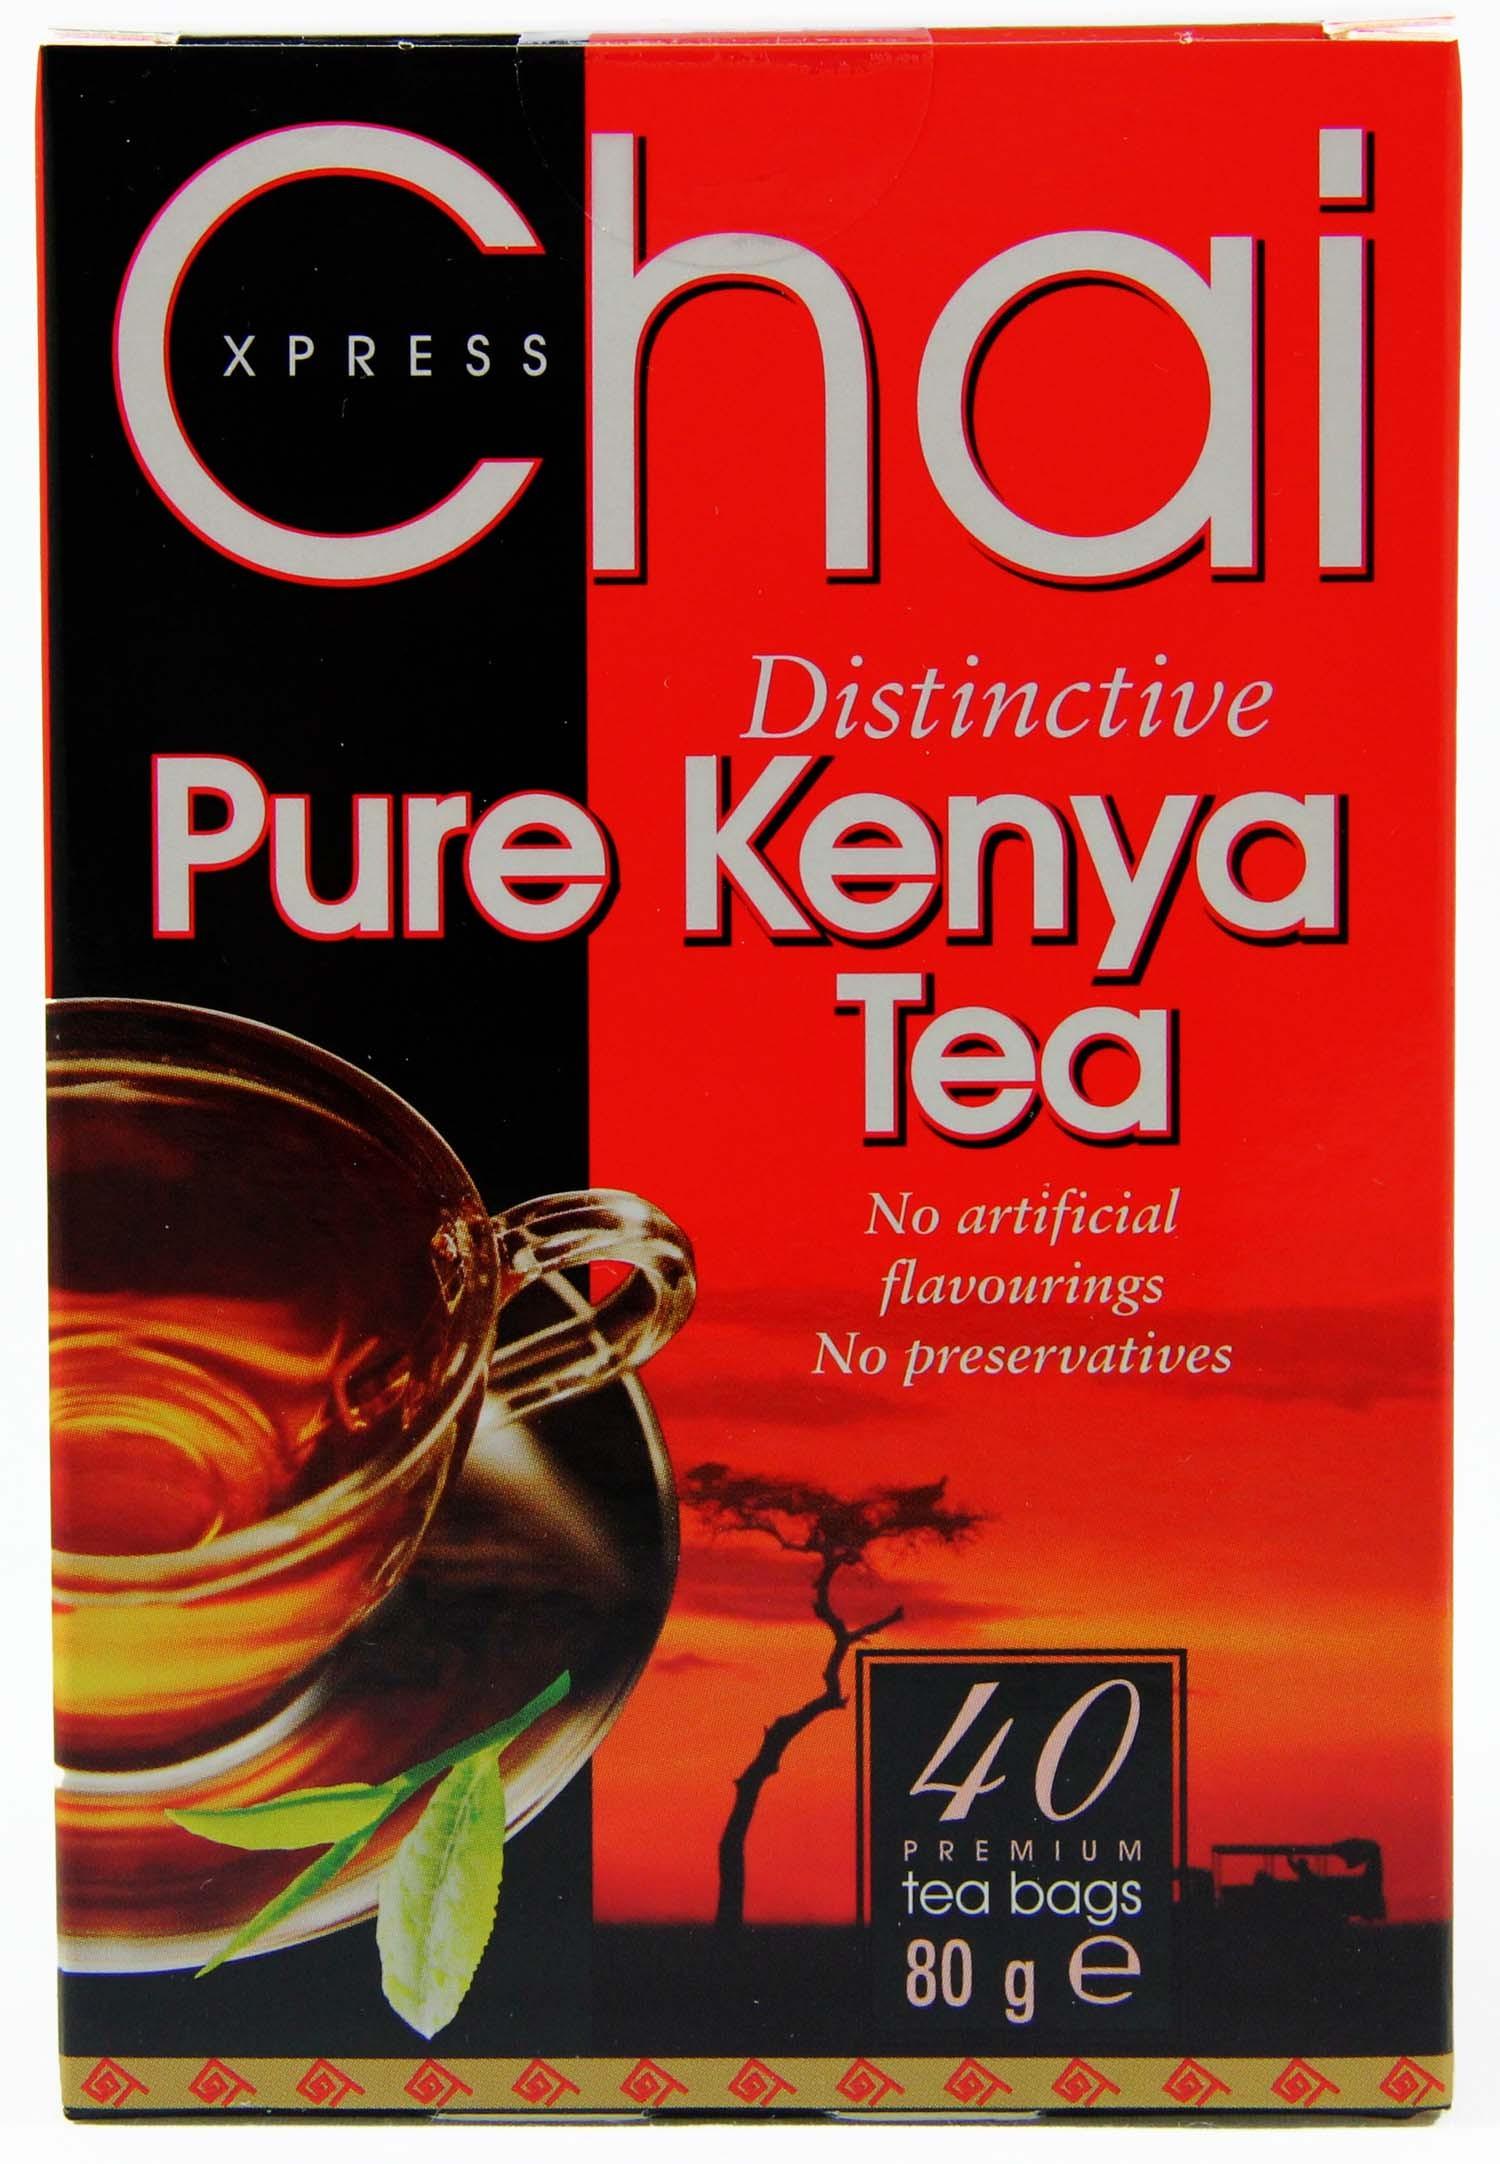 Chai Express Pure Kenyan Tea 40's